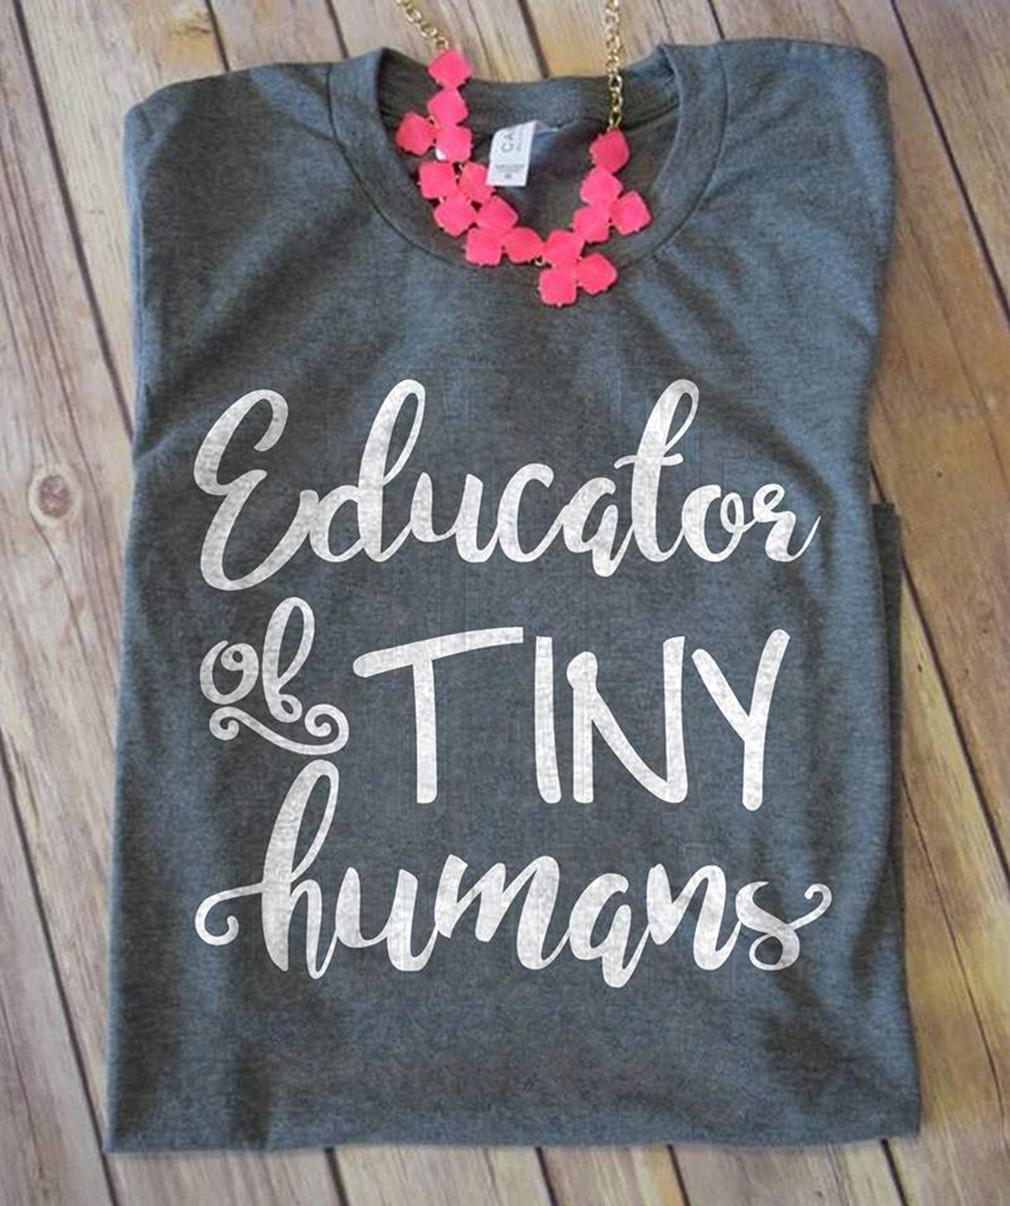 Educator of tiny humans shirt